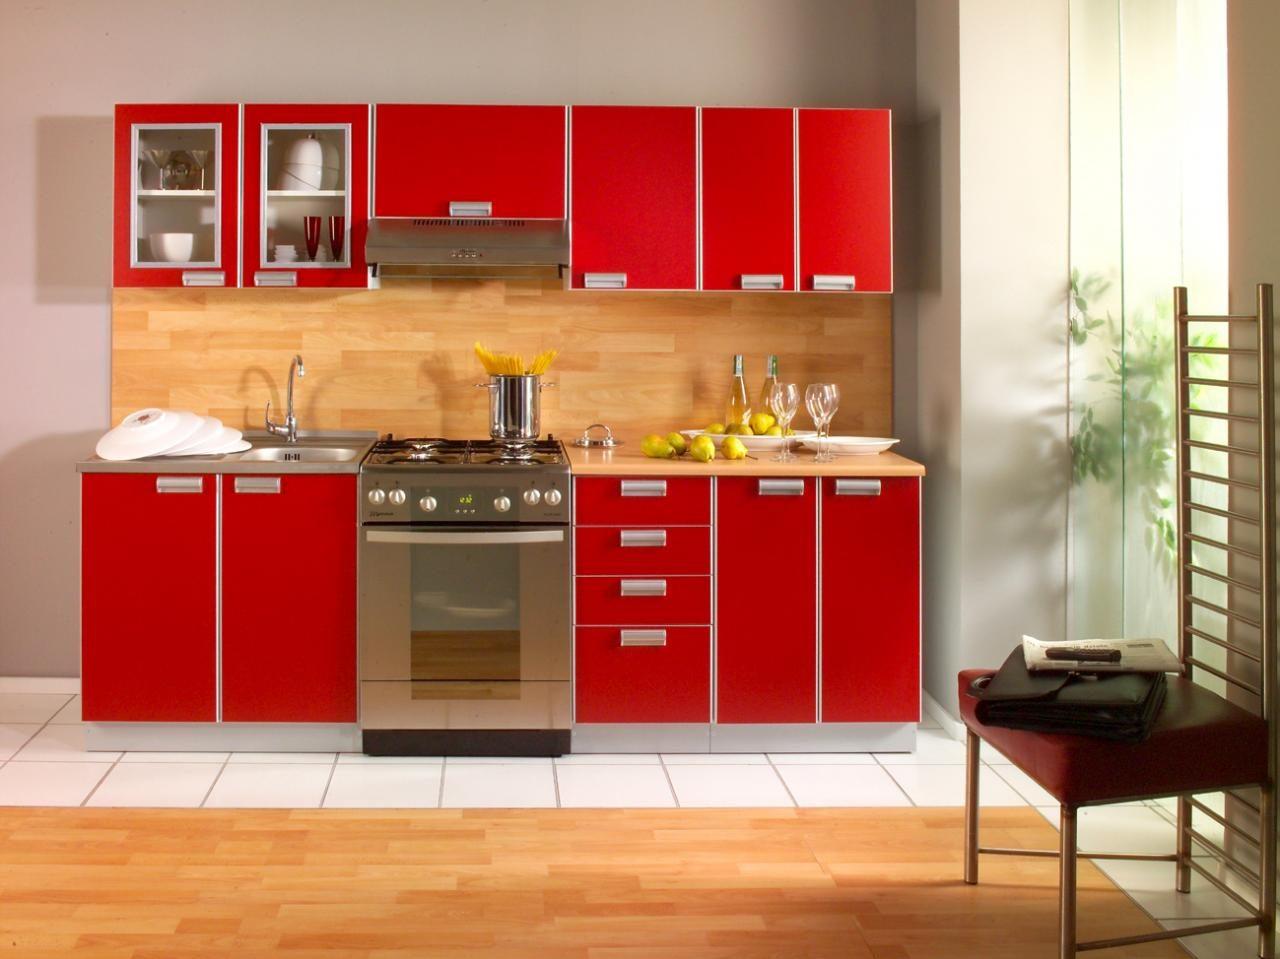 Colores modernos para cocinas - Cocinas de colores ...